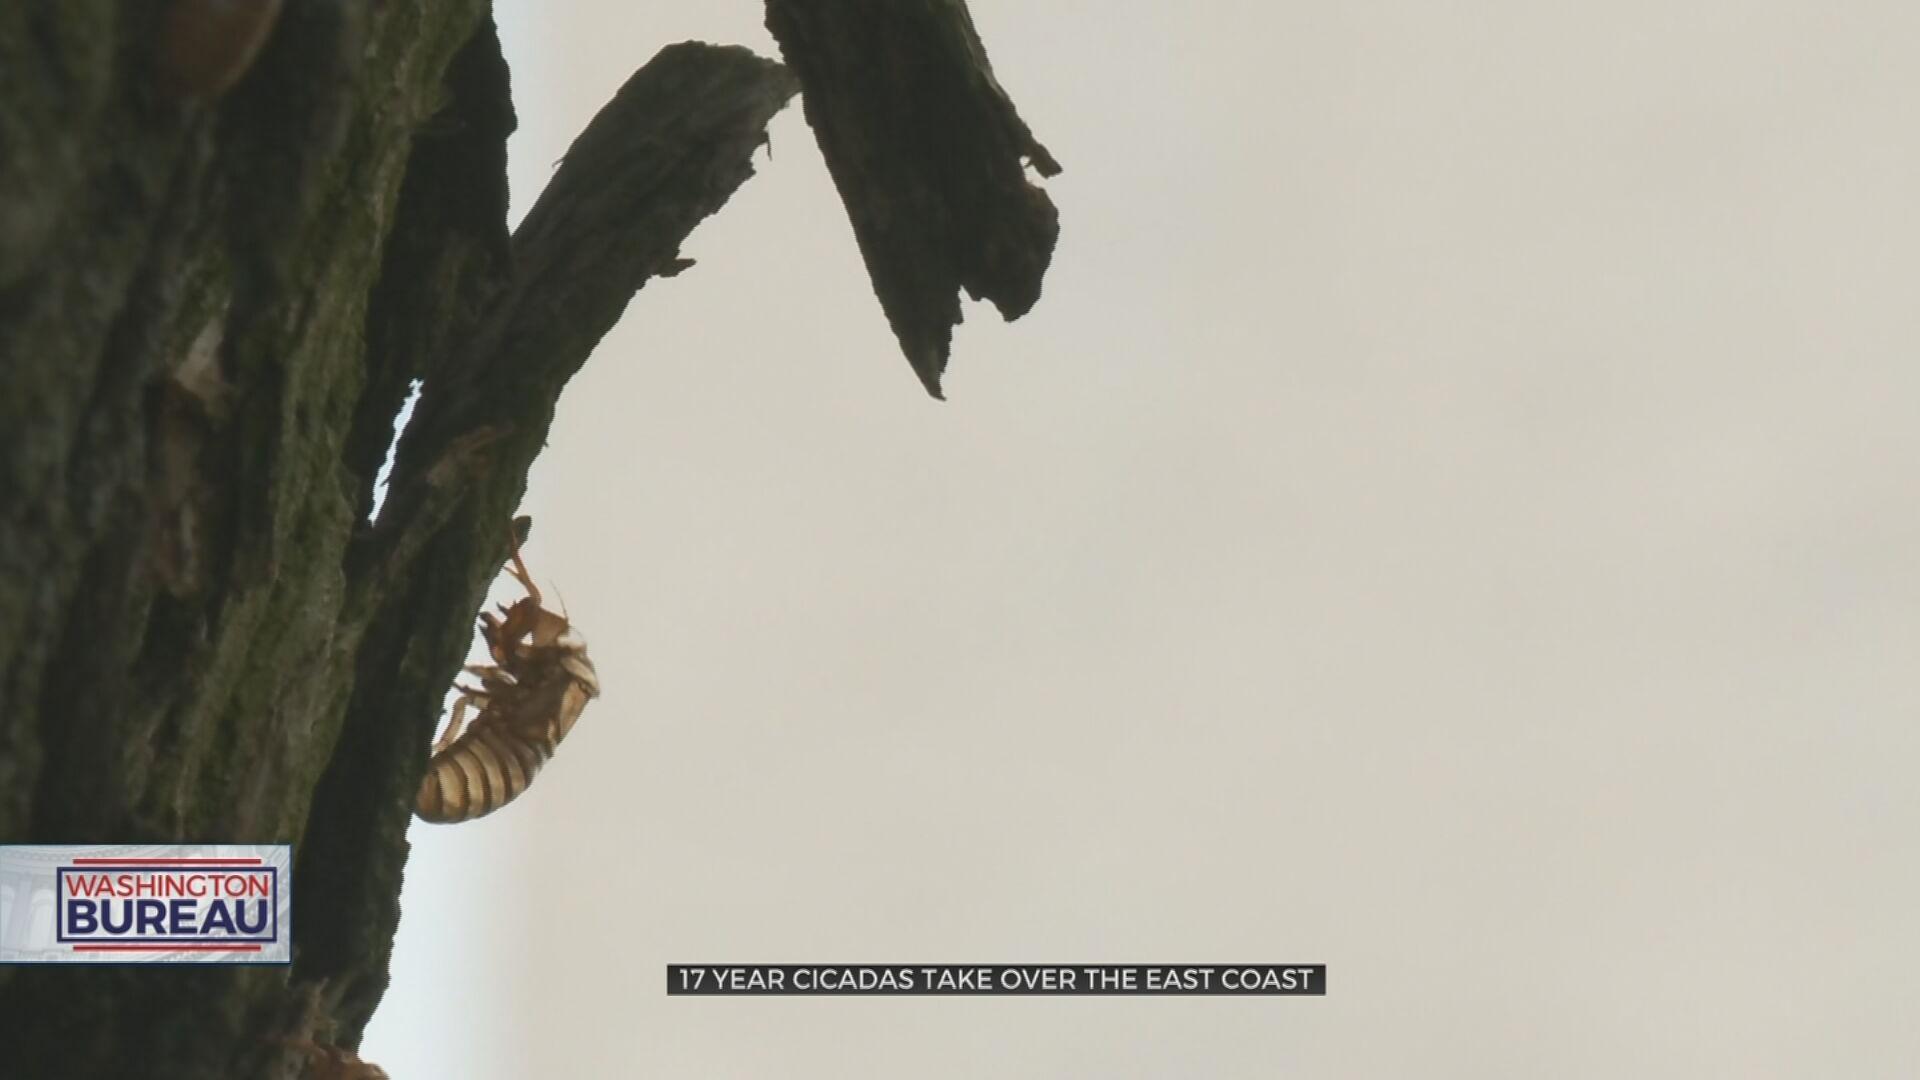 17-Year Brood X Cicadas Take Over Washington DC